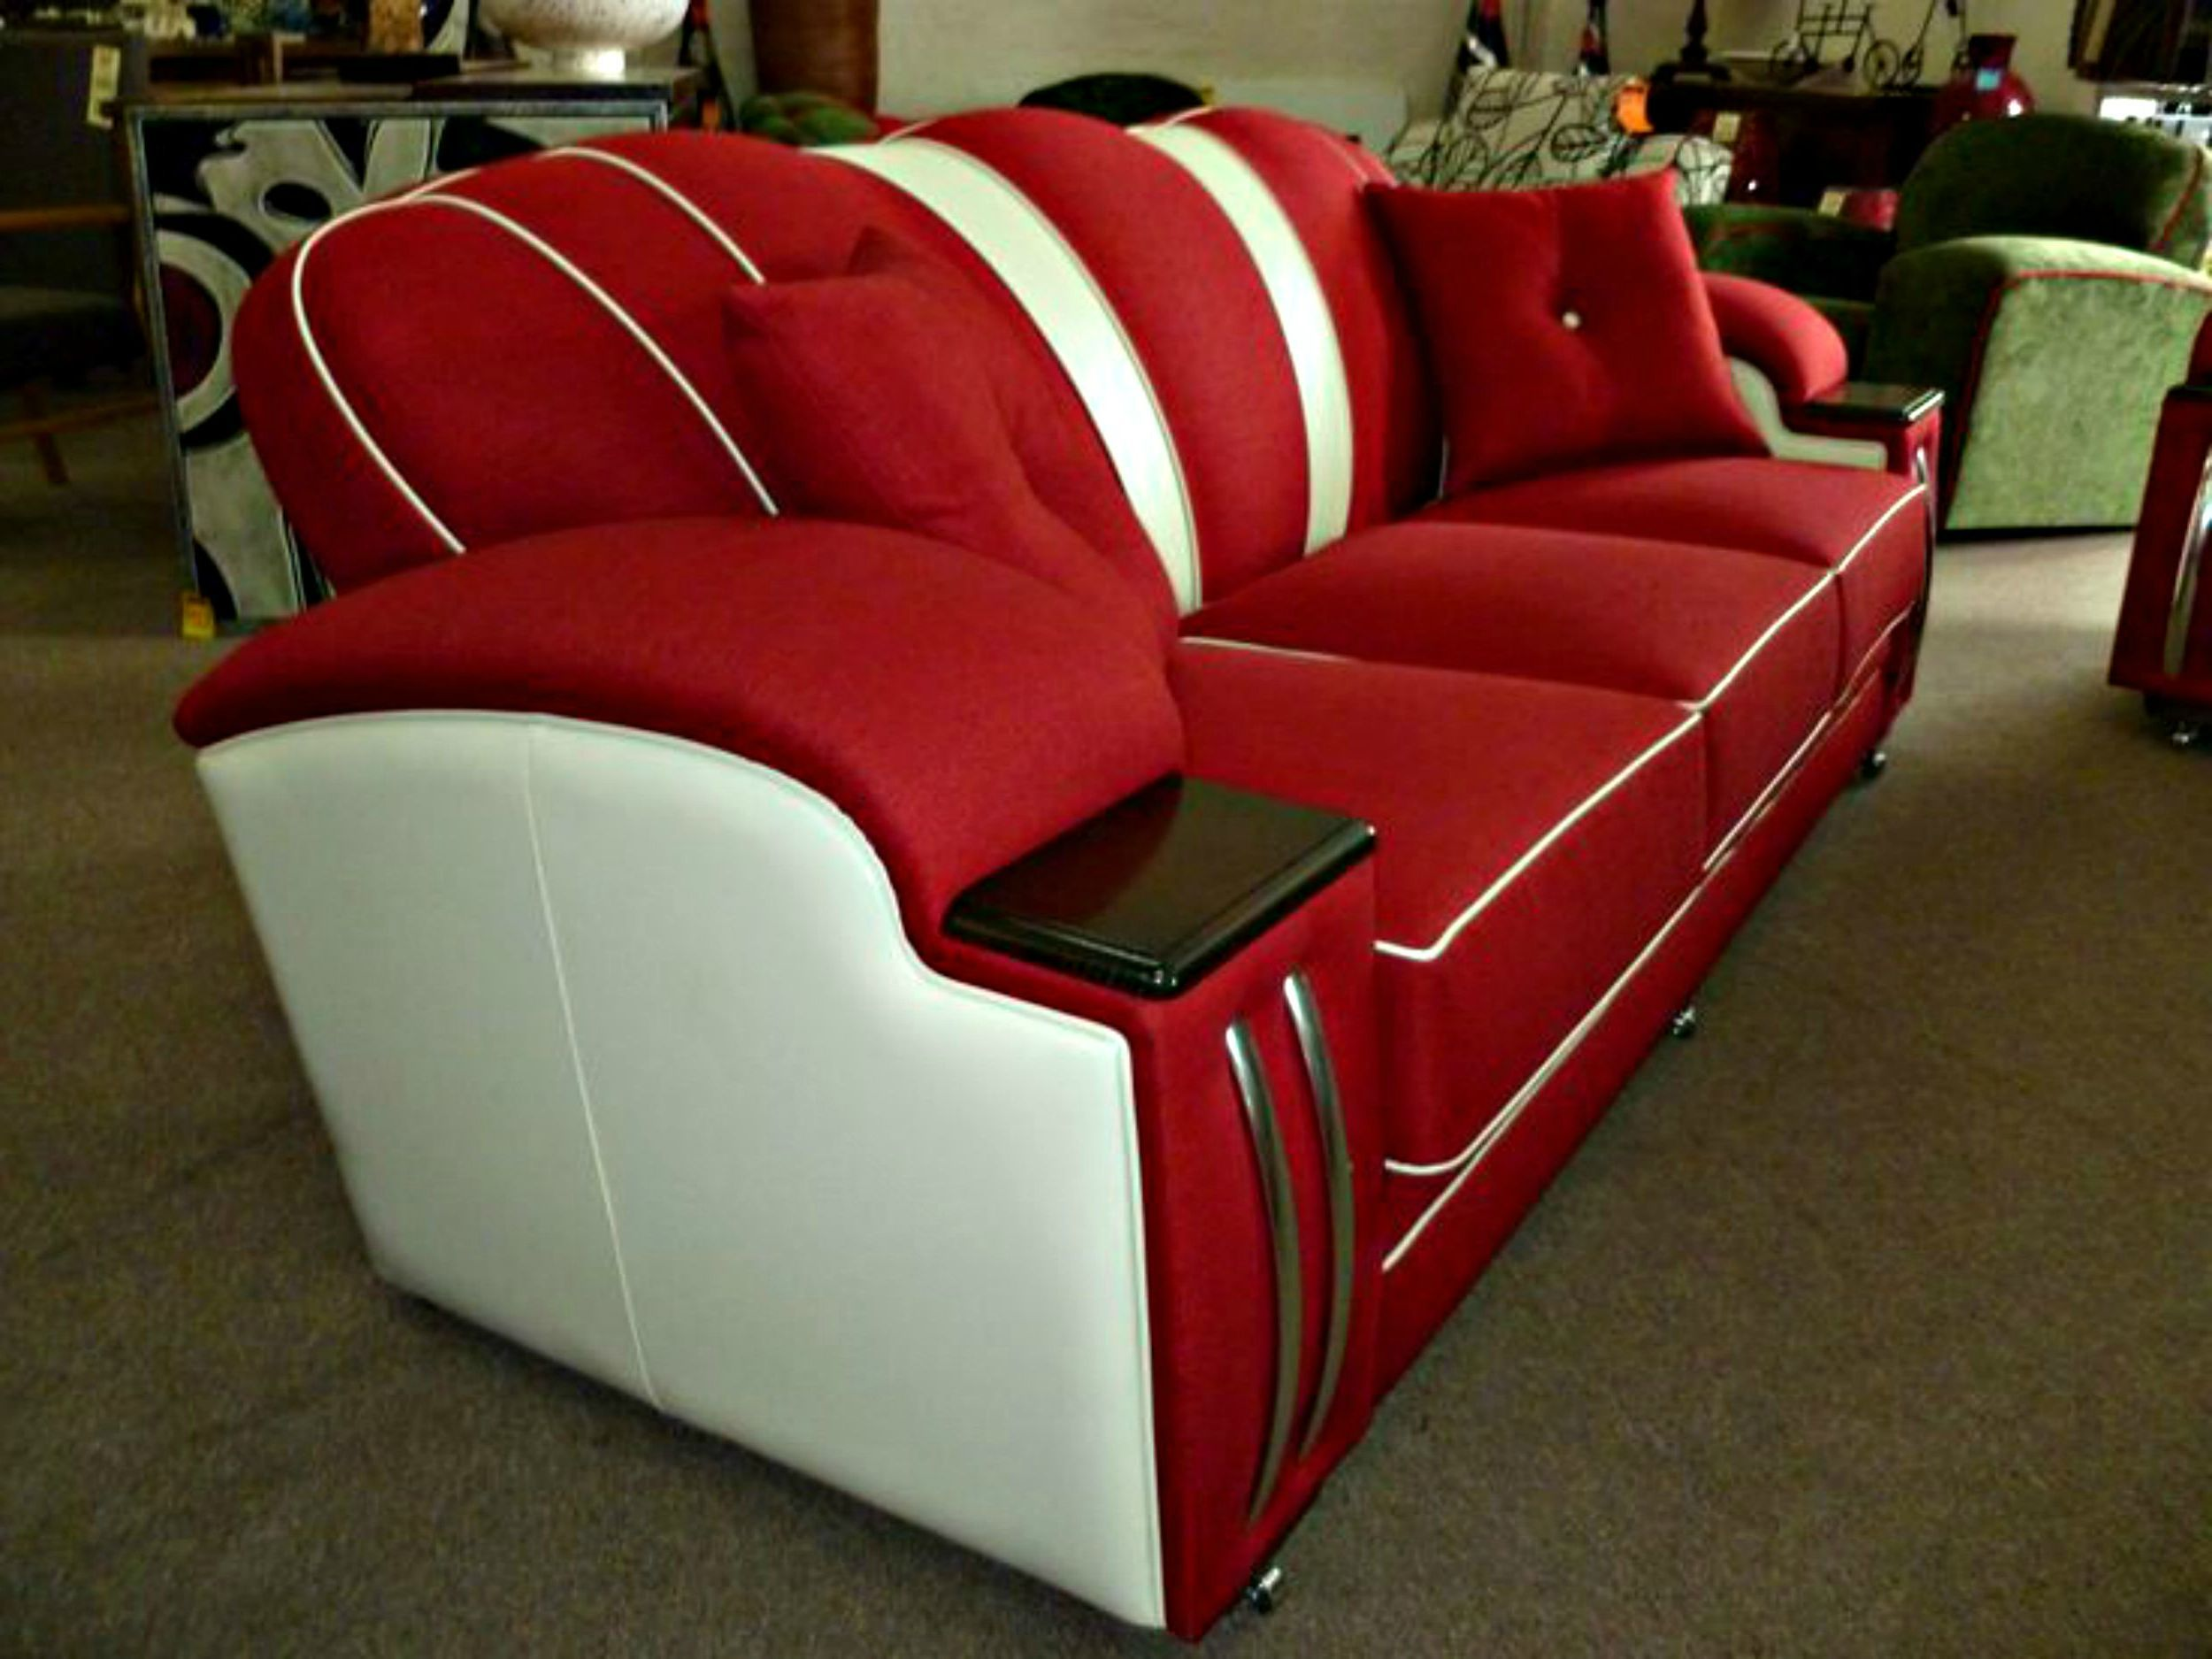 Art deco style loungesofasettee and chair custom